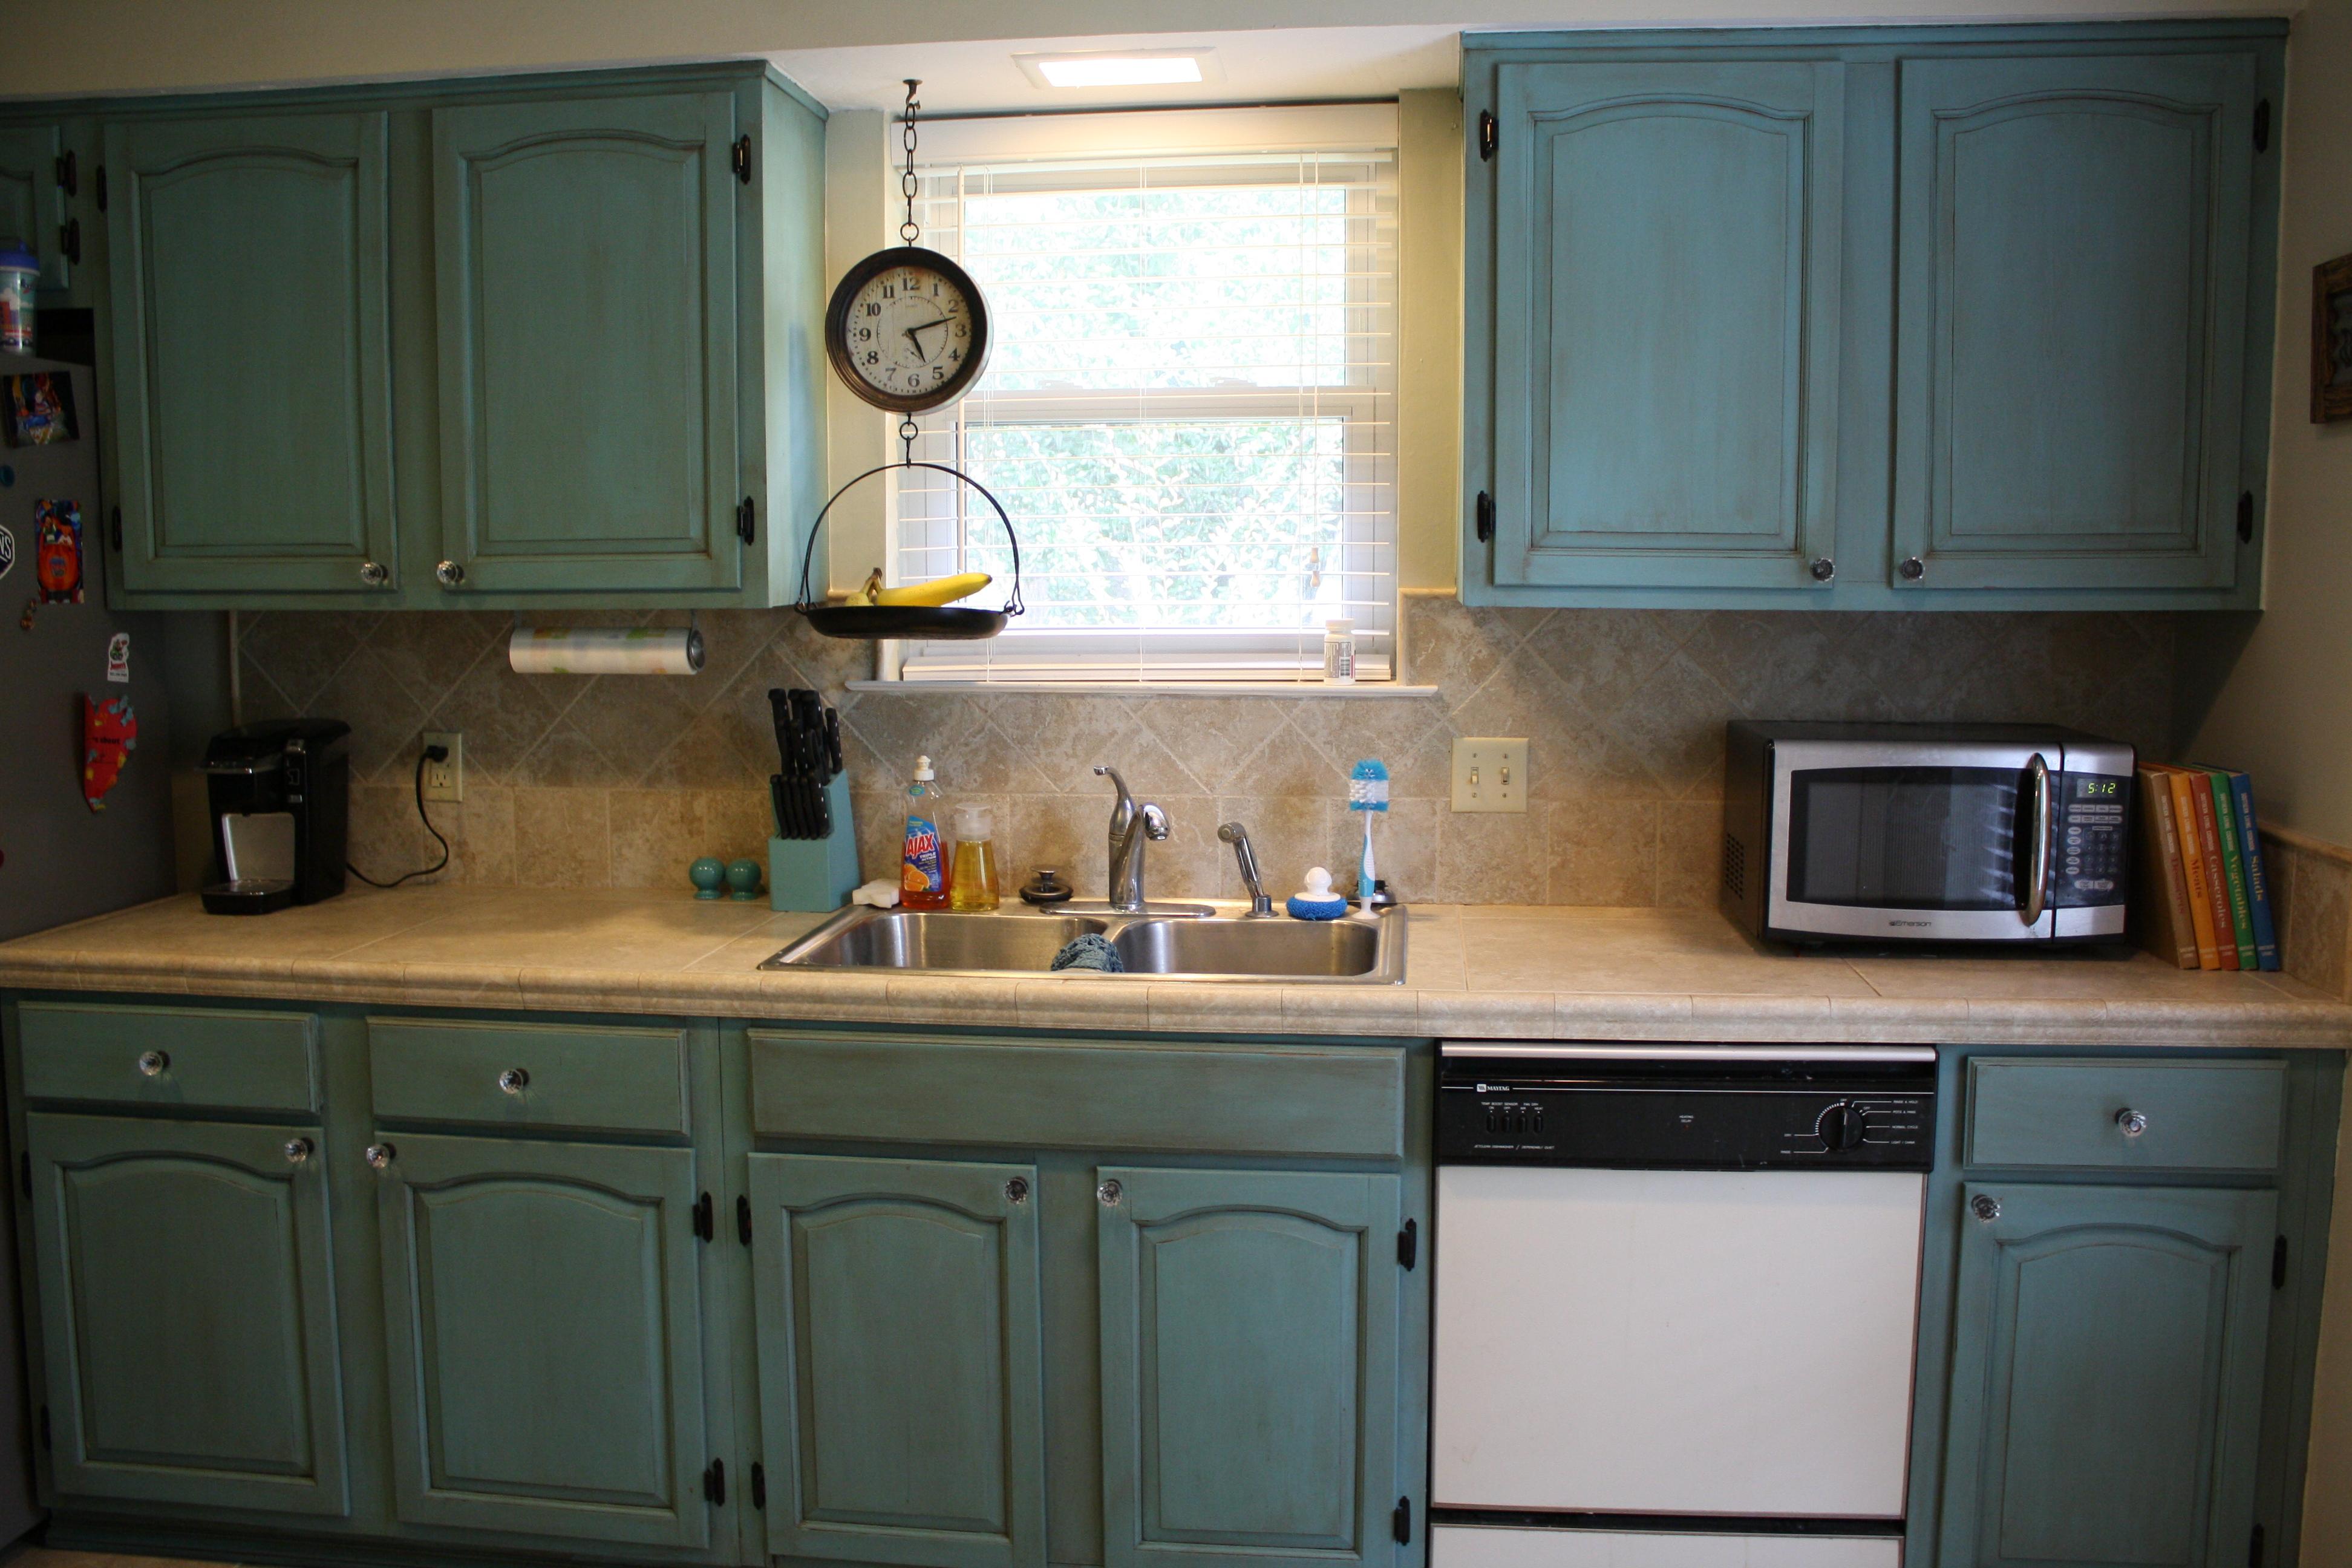 painting kitchen cabinets with annie sloan chalk paint northshore parent. Black Bedroom Furniture Sets. Home Design Ideas